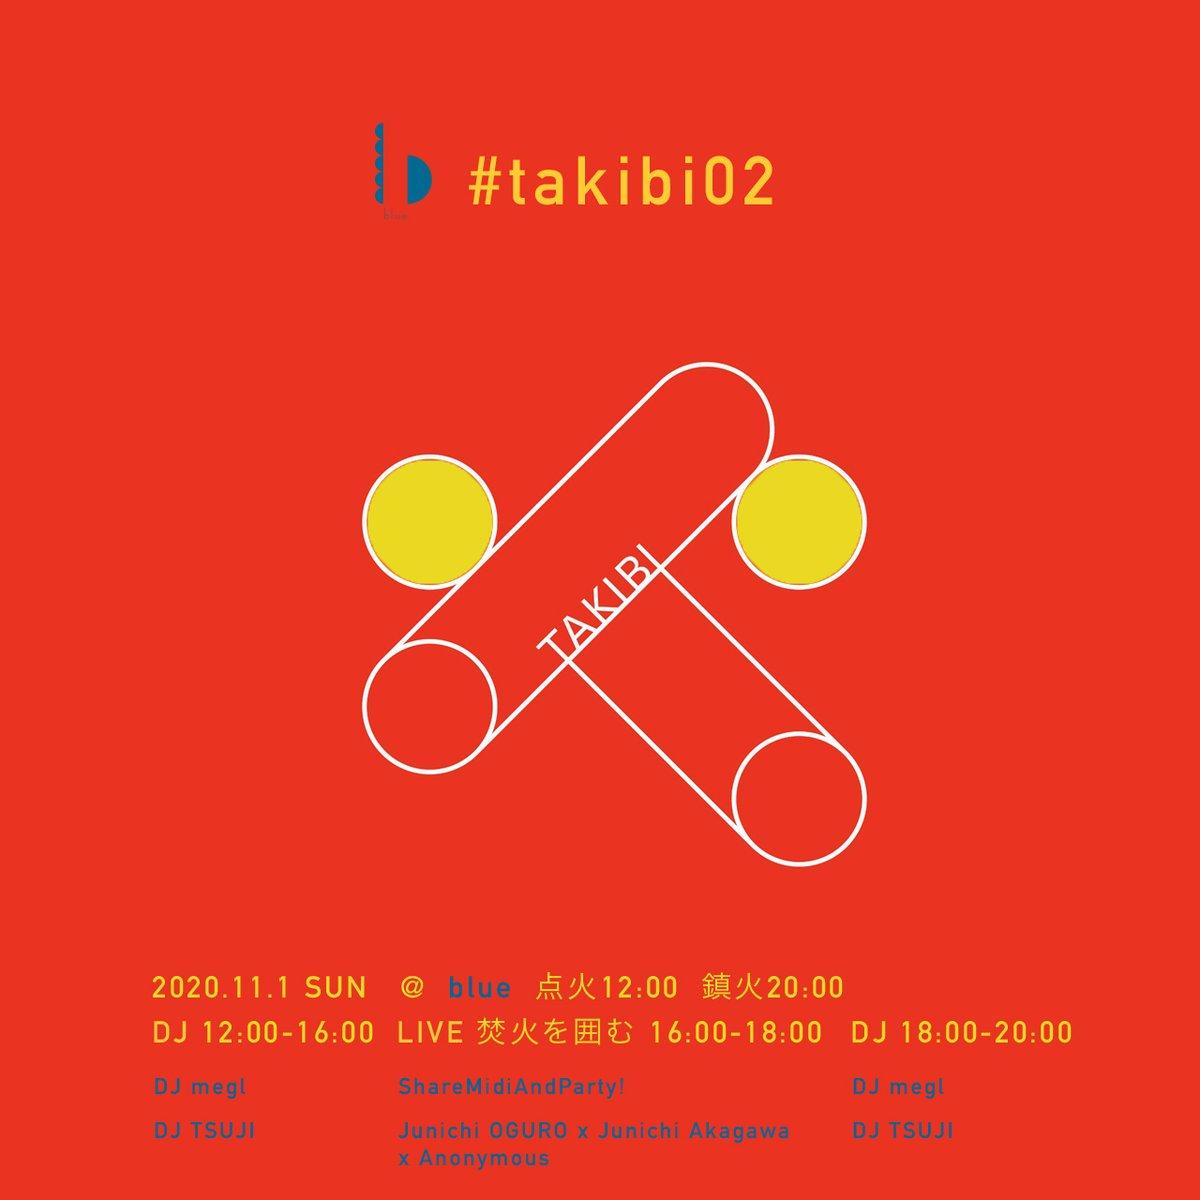 """TAKIBI Vol.02"" 11/1日曜 at Blue 点火12:00鎮火20:00 (エントランスフリー) 12:00-16:00 DJ megl / DJ TSUJI 16:00-18:00 焚火を囲む Live ""SMAP"" @JunichiOGURO x @JunichiAkagawa x Anonymous 18:00-20:00 DJ megl / DJ TSUJI Logo design Ryuichi Kawajiri  Sapporo,JAPAN #takibi02 https://t.co/p9EL0HtZyg"